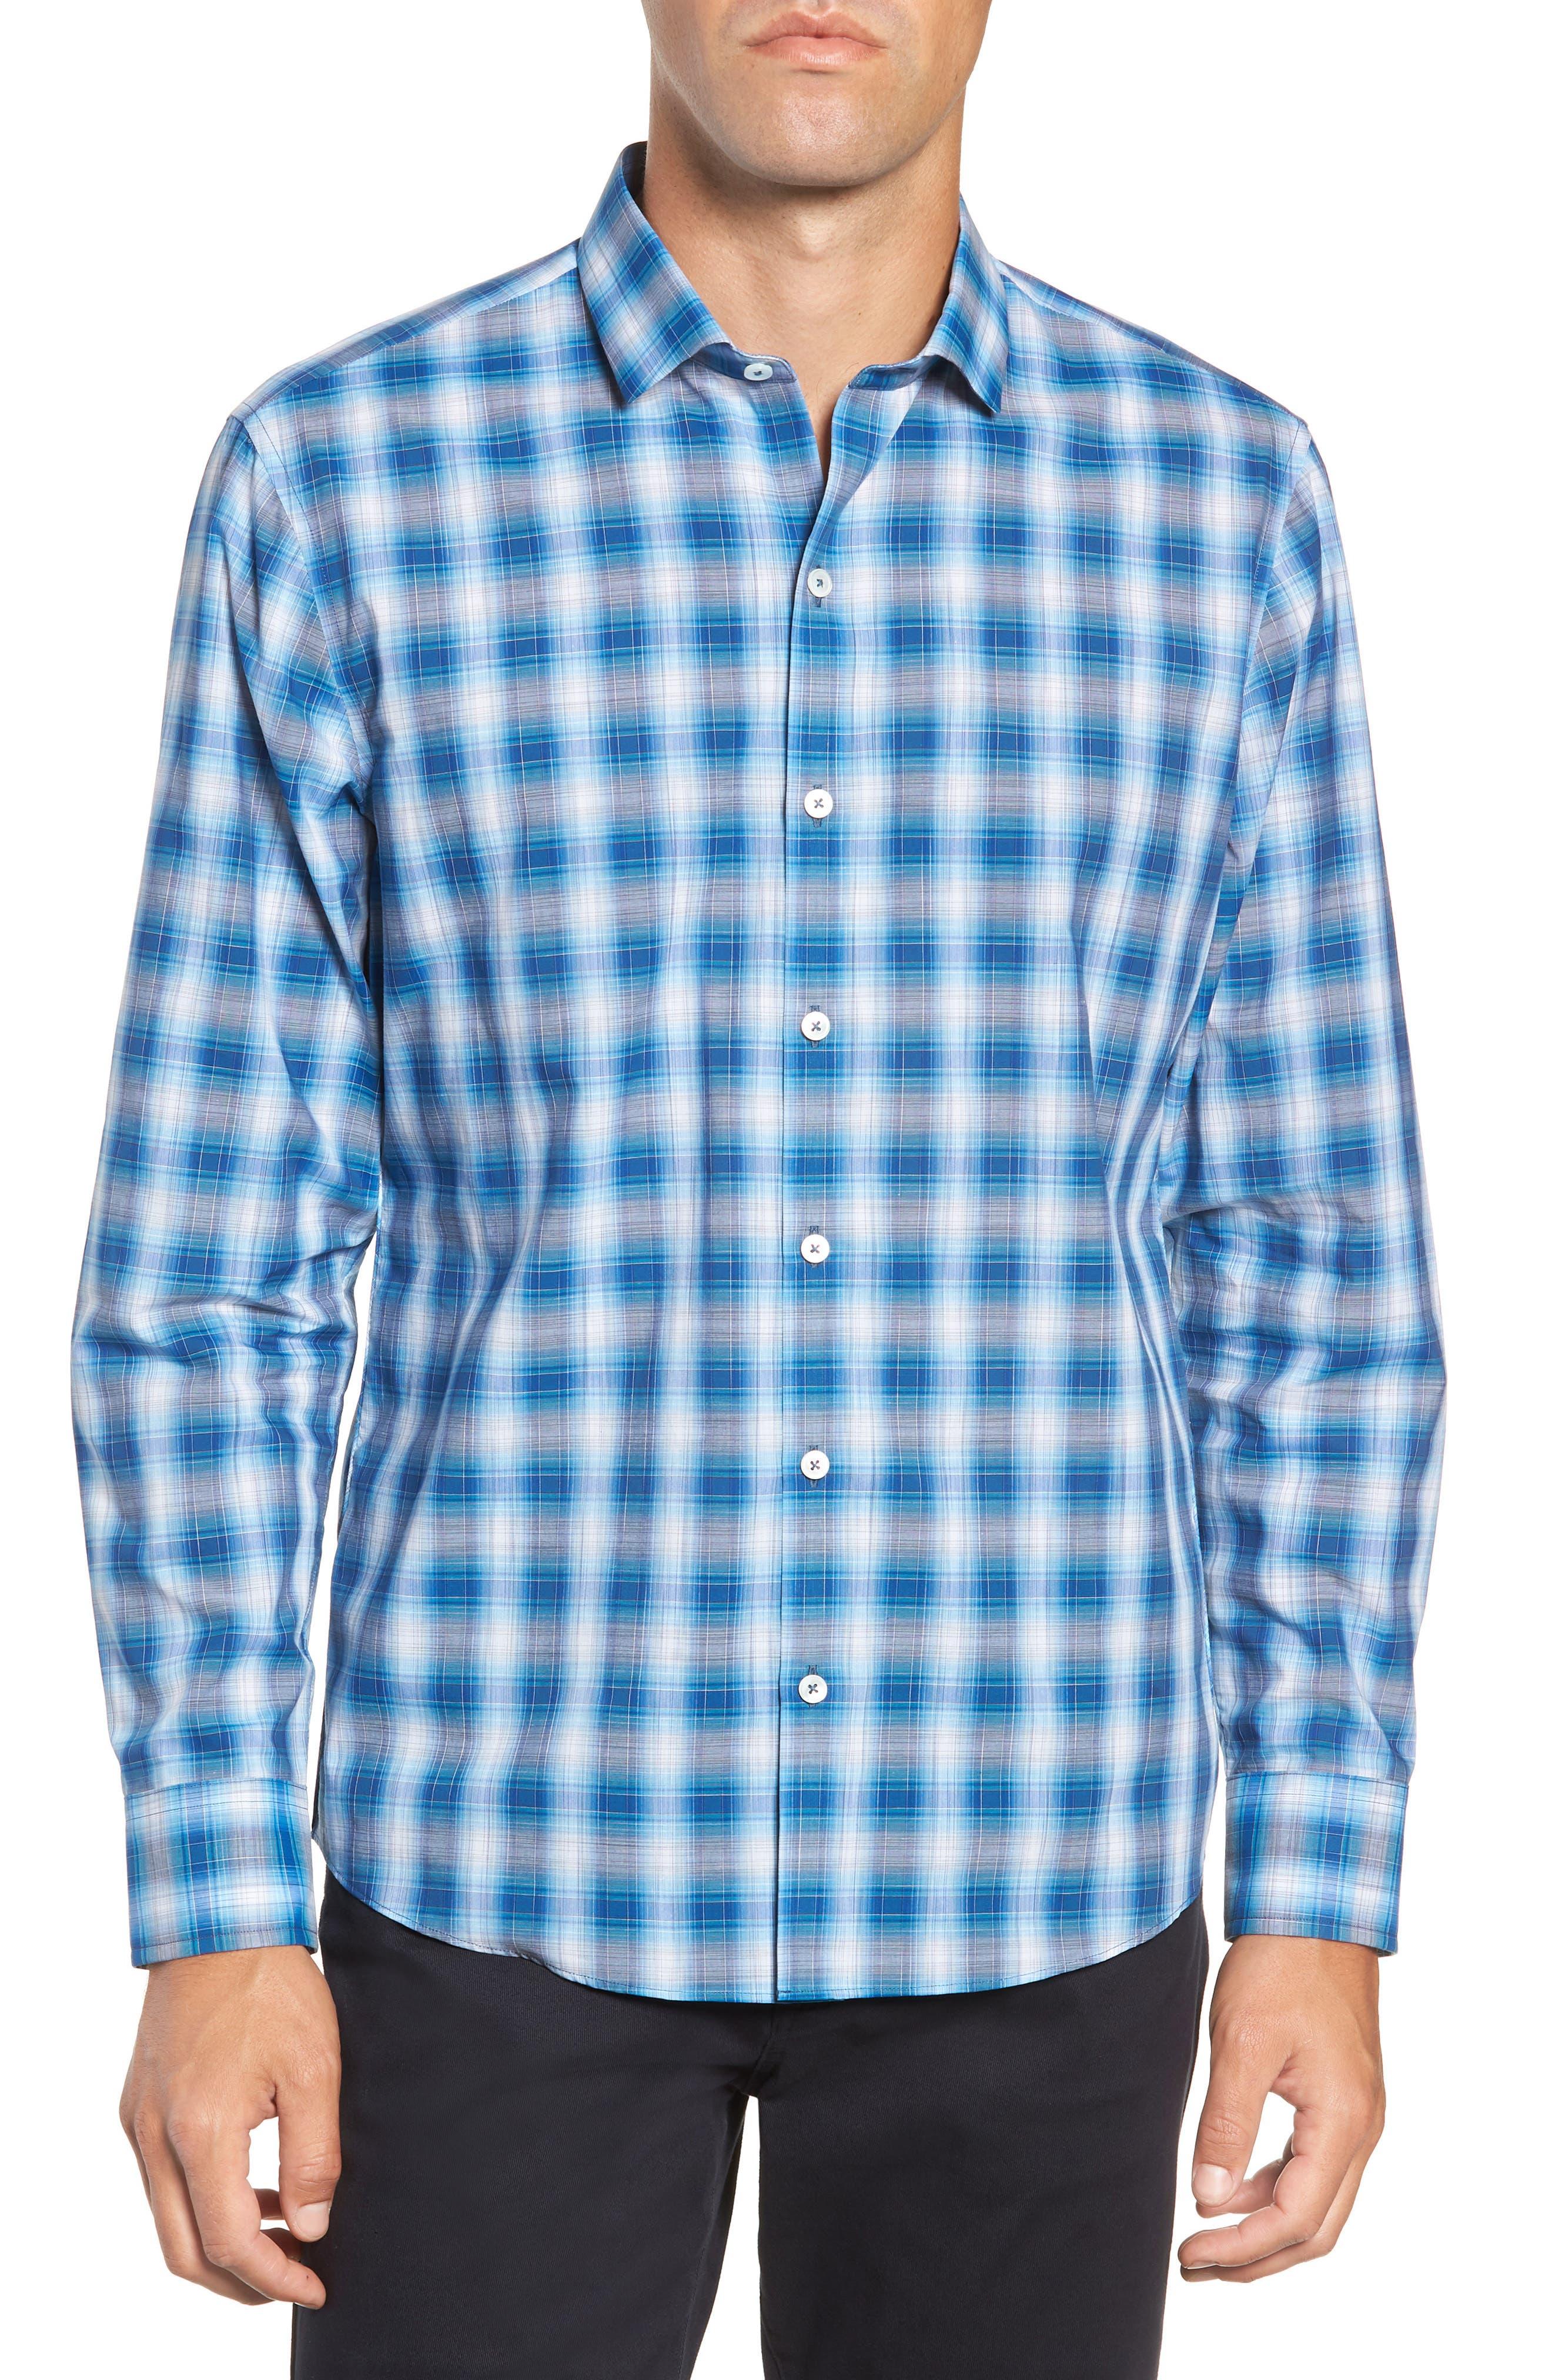 Holtsinger Plaid Sport Shirt,                             Main thumbnail 1, color,                             BRIGHT BLUE